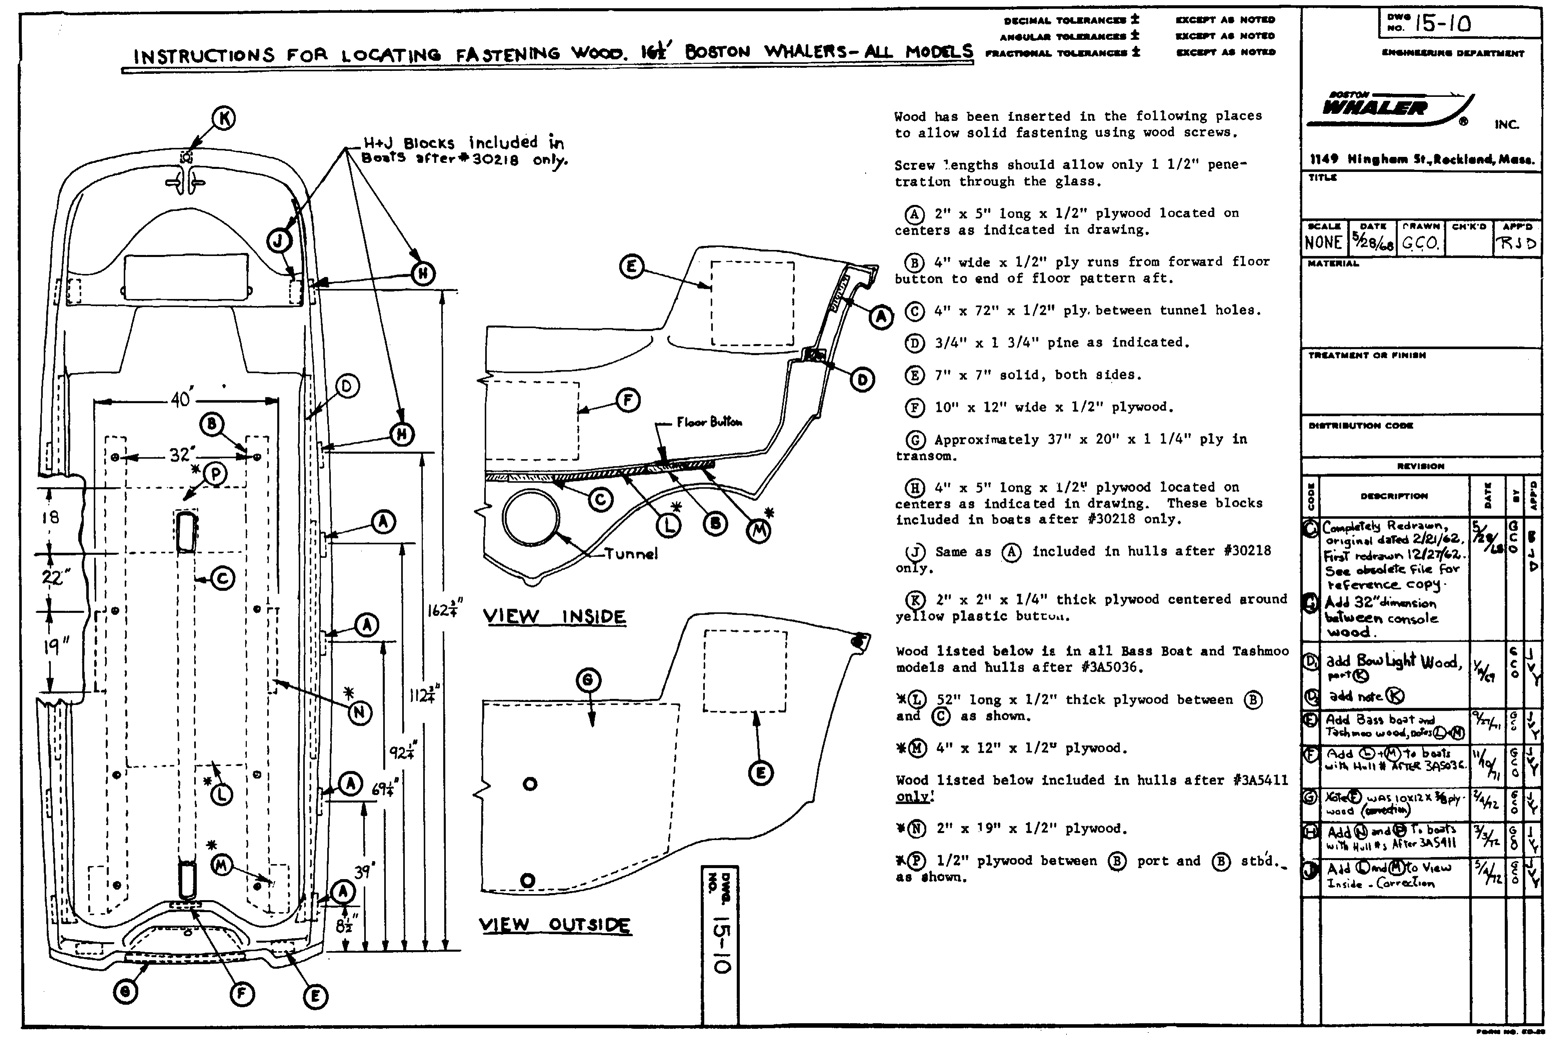 16WoodDWG15 10?resize=665%2C444 harrington hoist wiring diagram wiring diagram Harrington Chain Hoist Parts at edmiracle.co